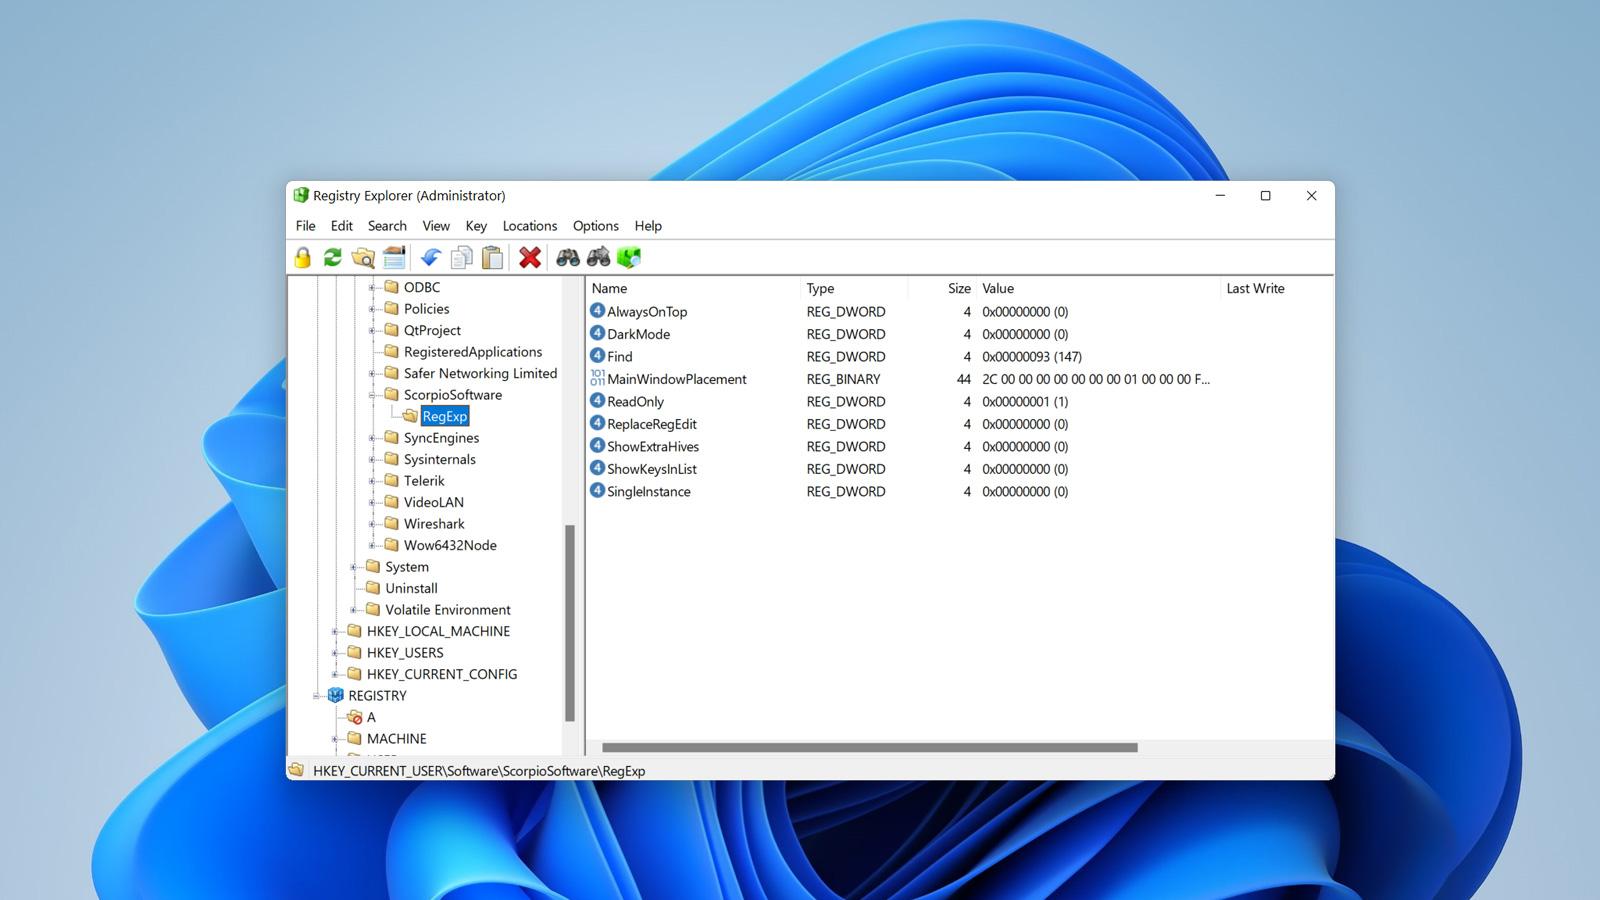 Registry Explorer header image